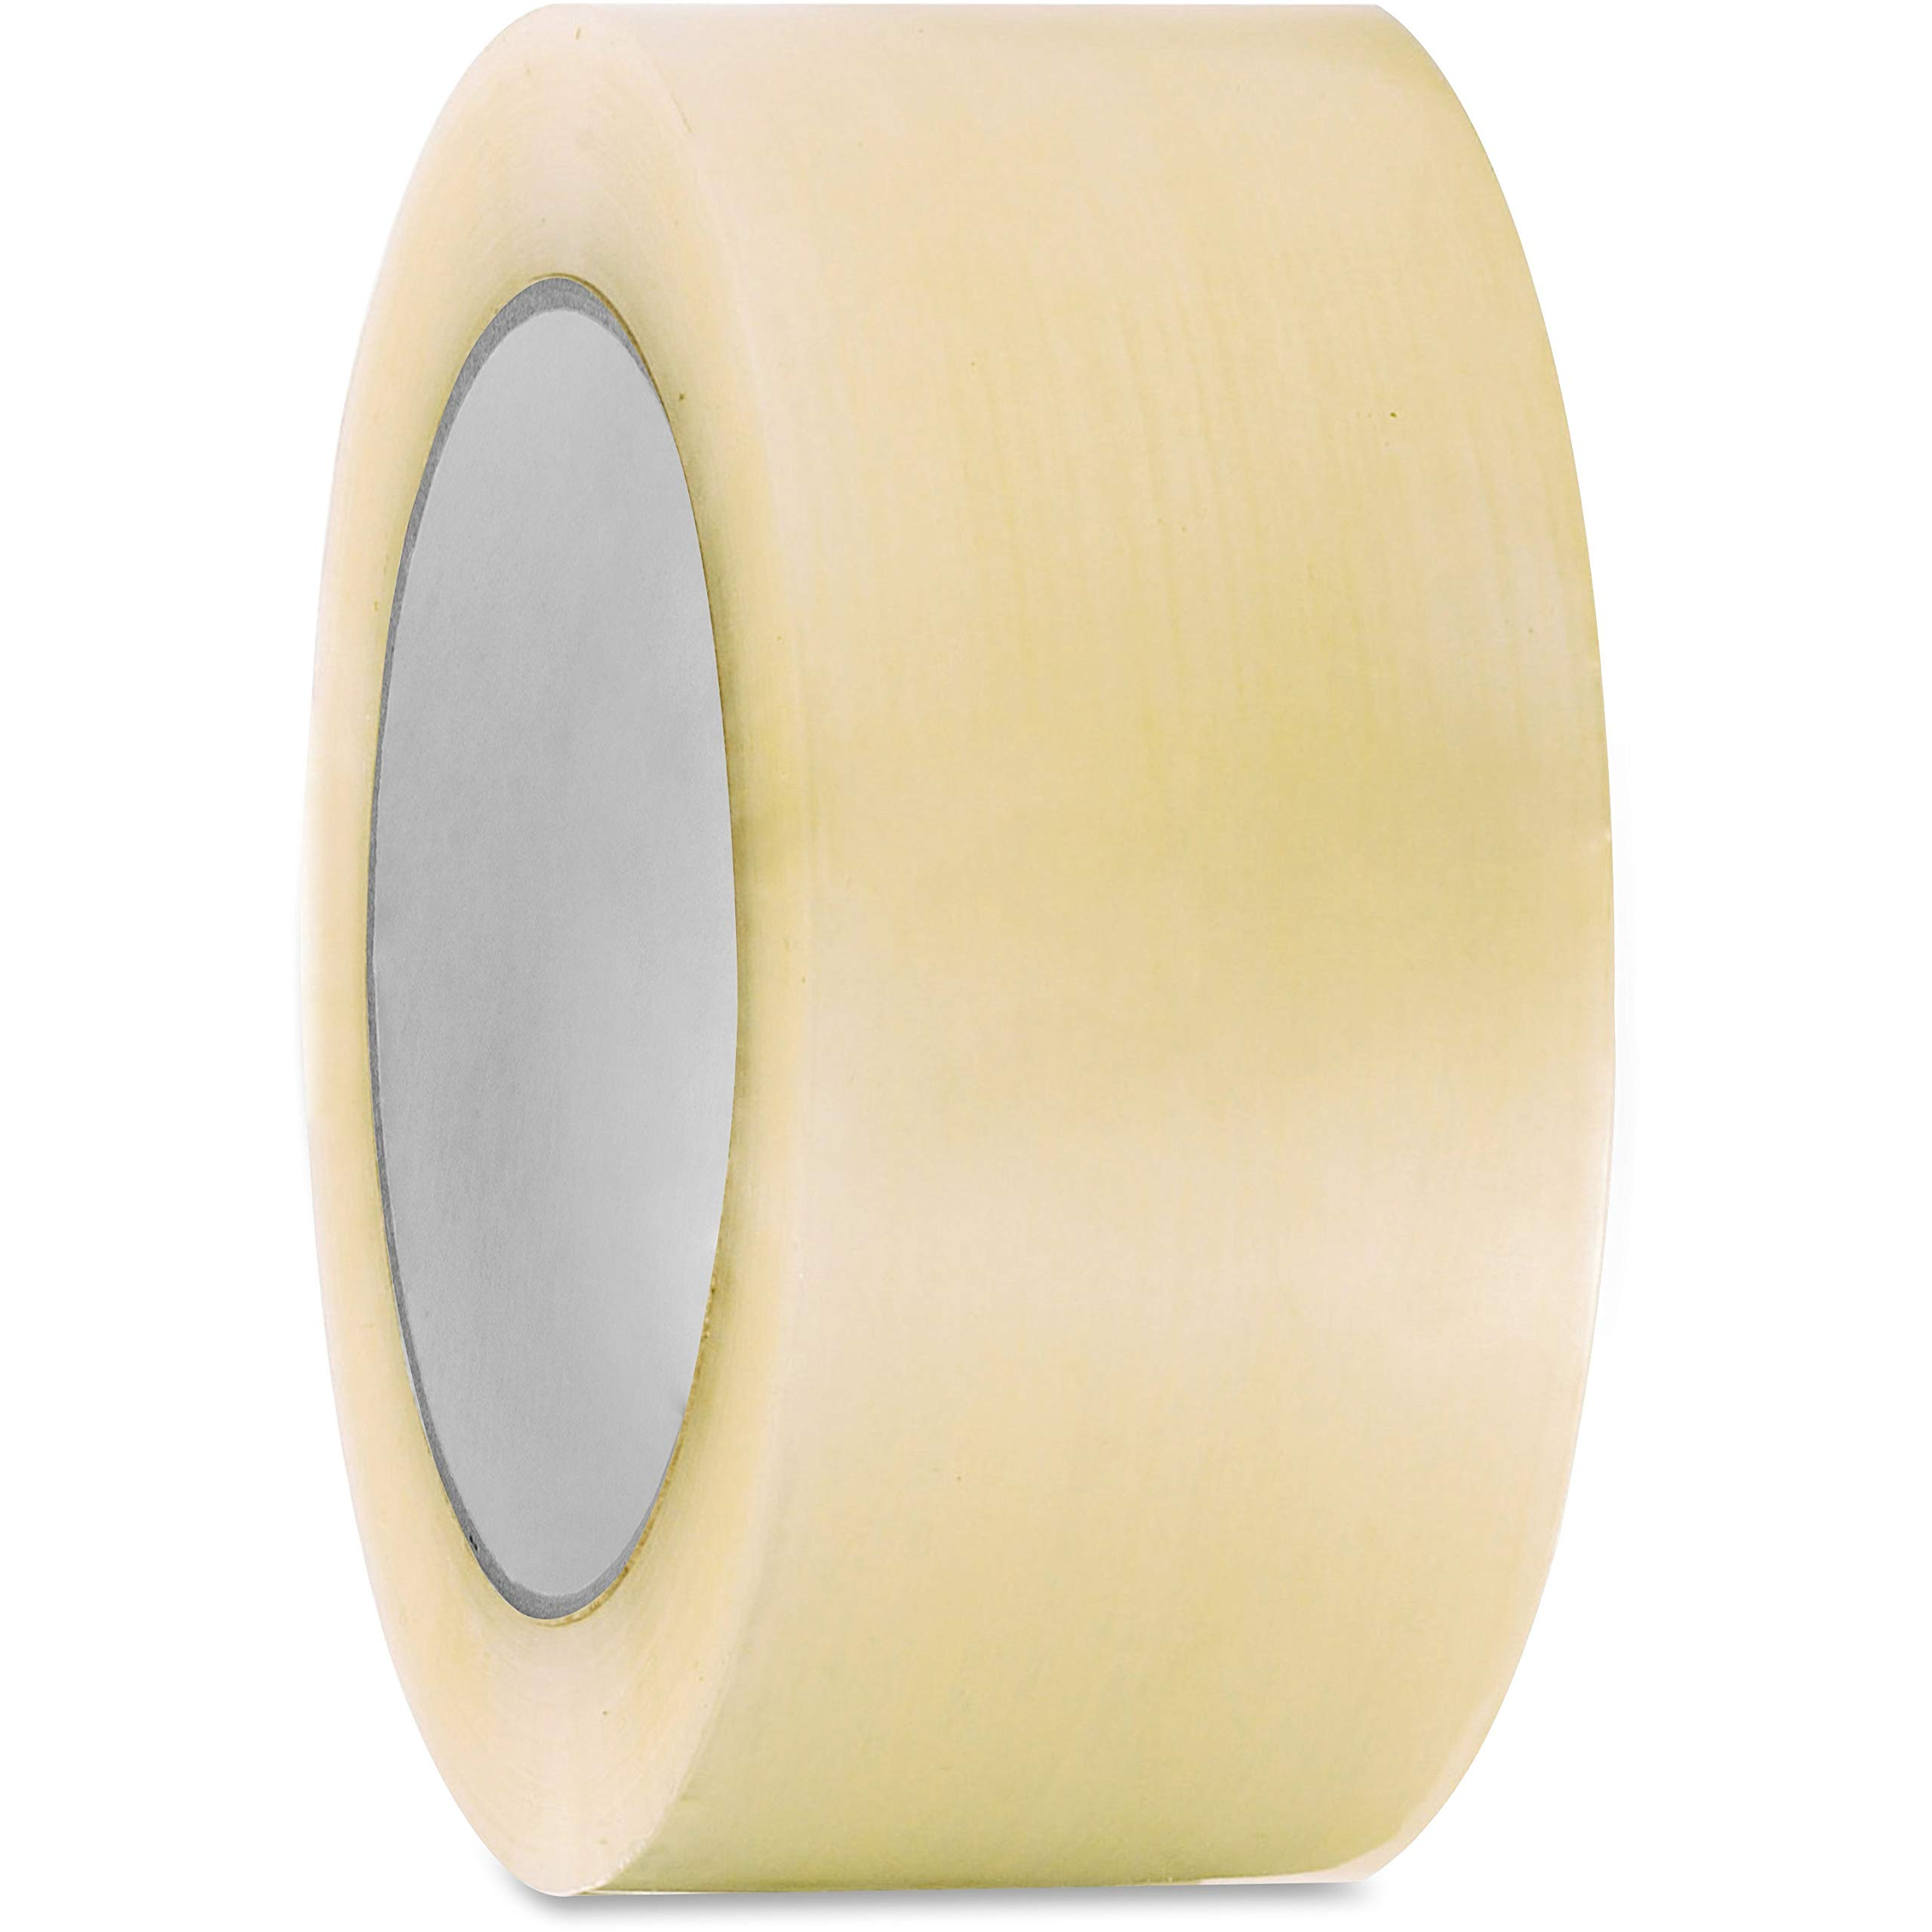 SPR74950 - Sparco 1.9mil Hot-melt Sealing Tape